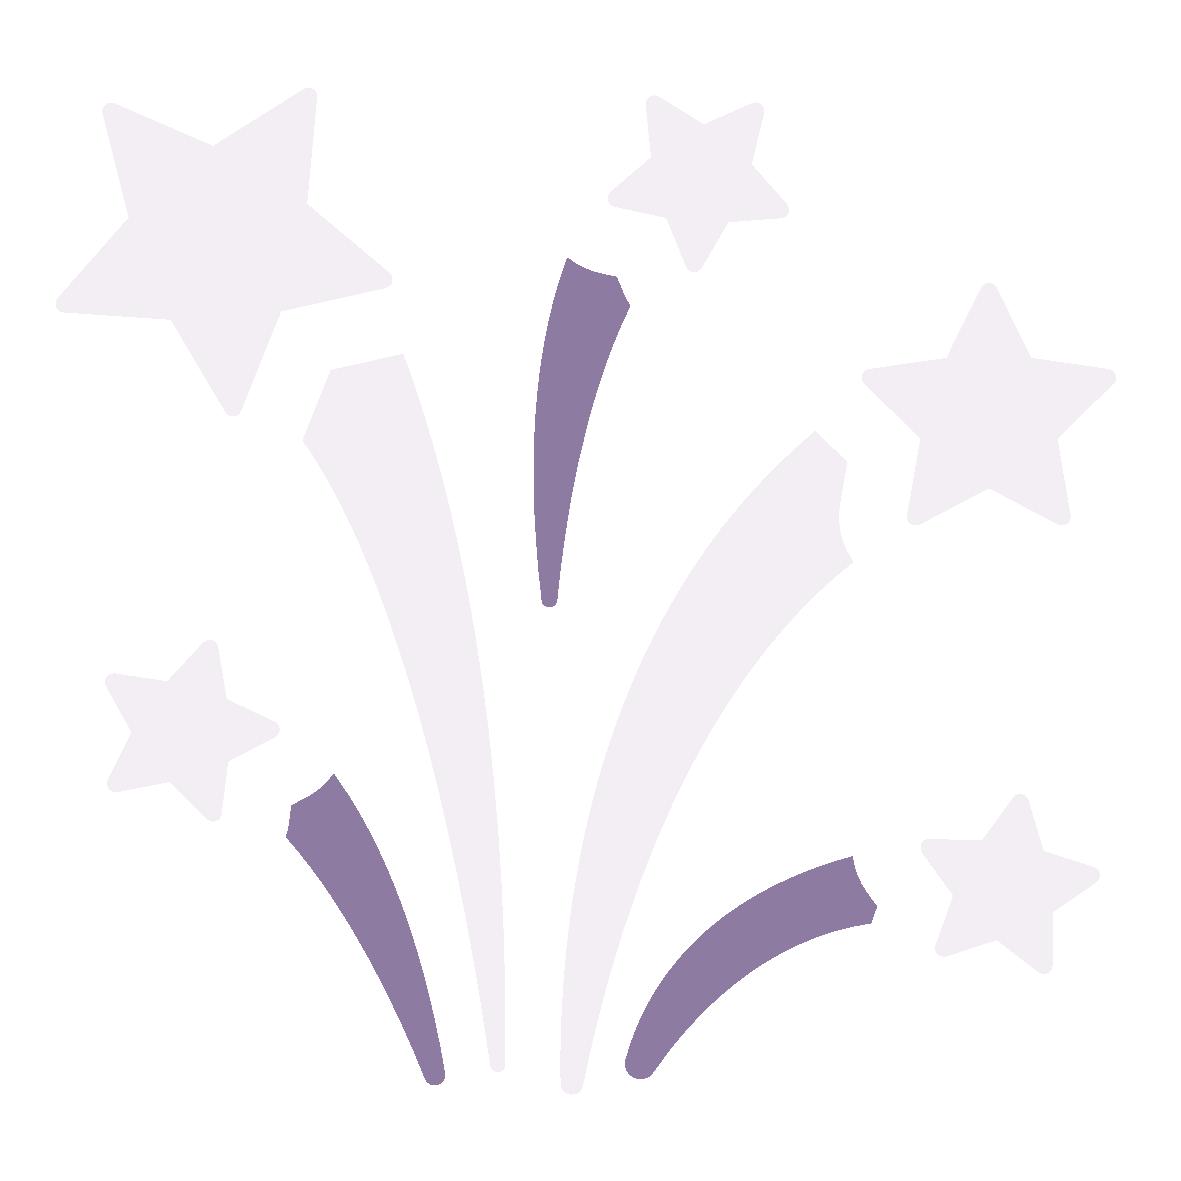 icon-speaking-inverted